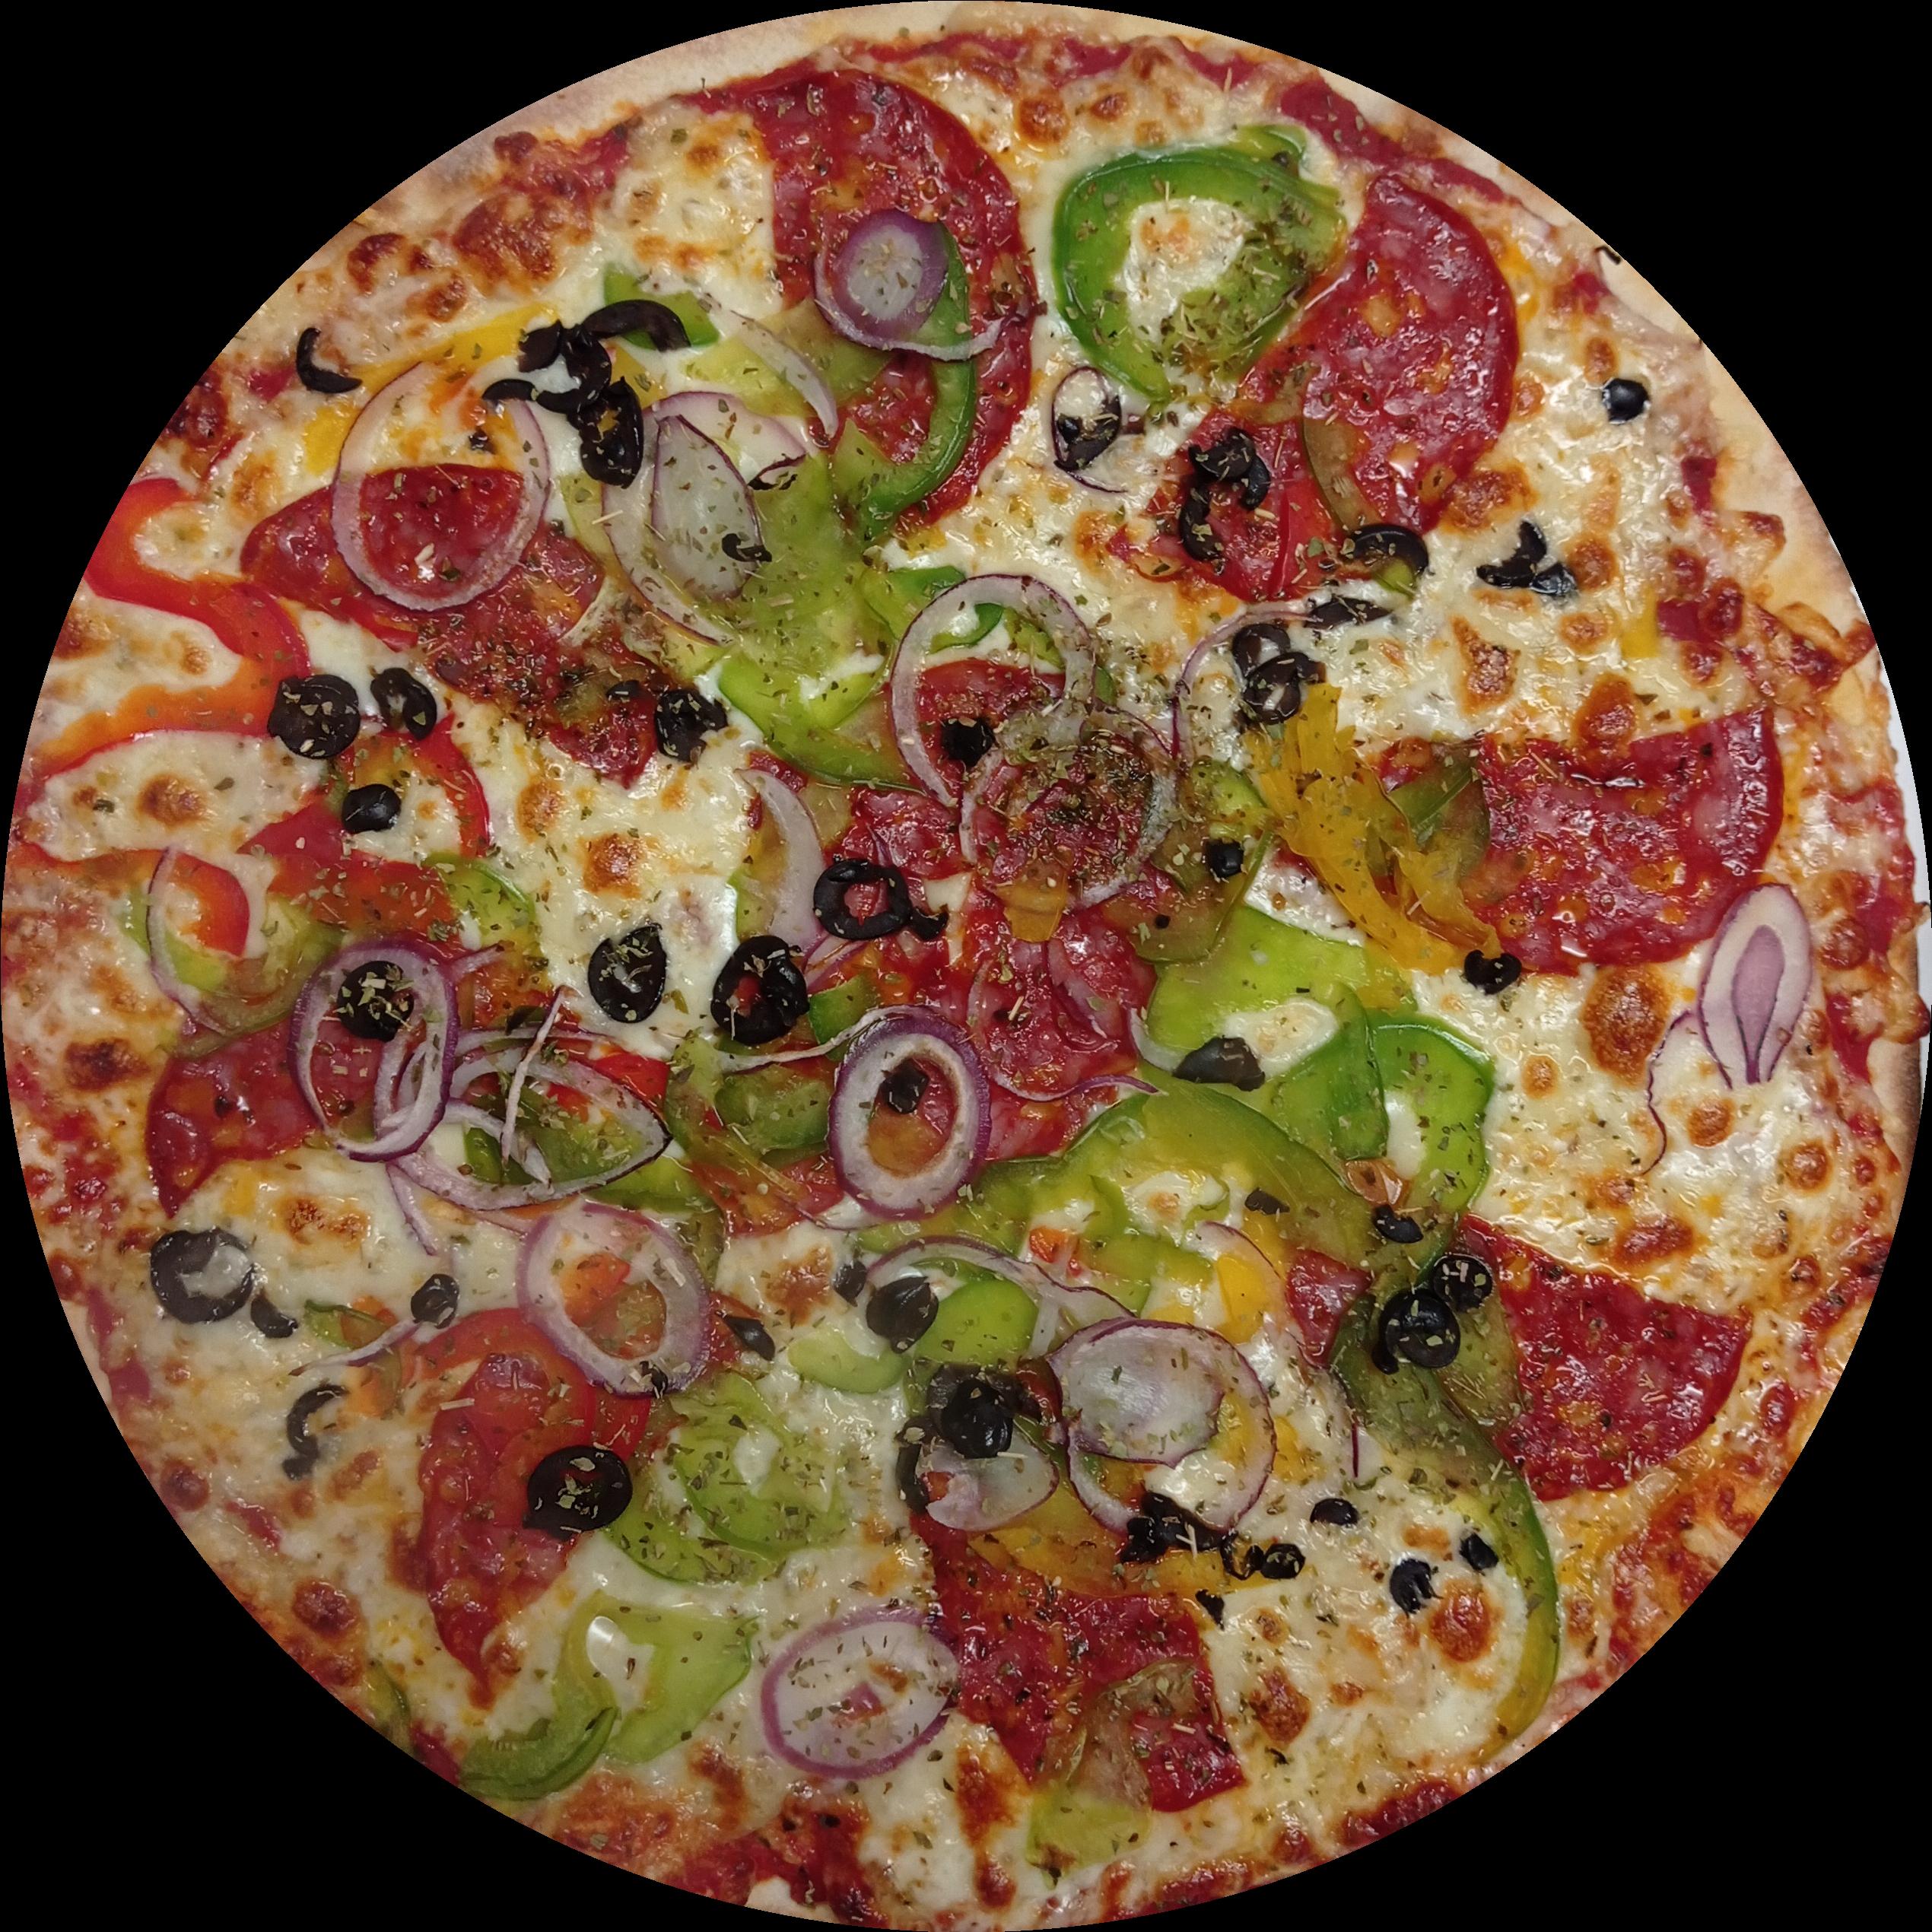 La Petite Pizza - Food truck